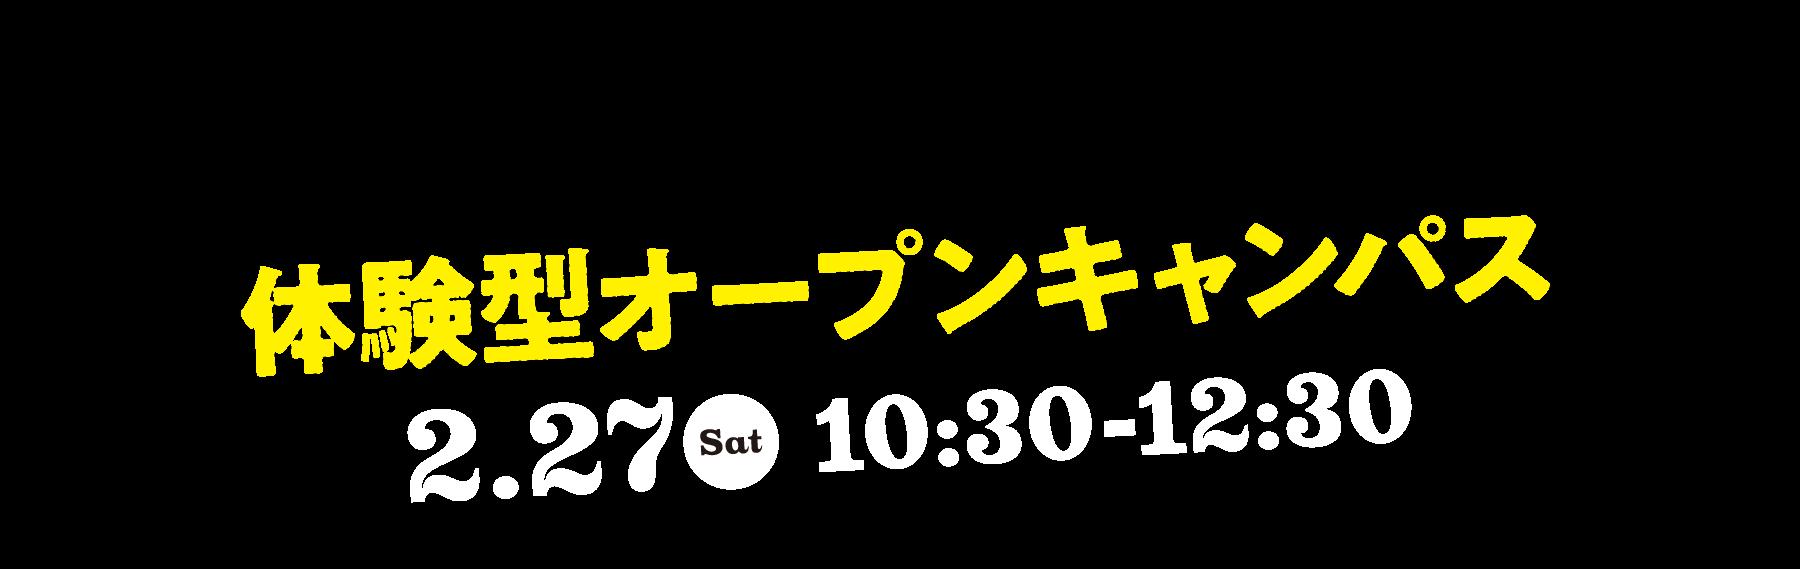 Open Campus 体験型オープンキャンパス 2.27 10:30-12:30